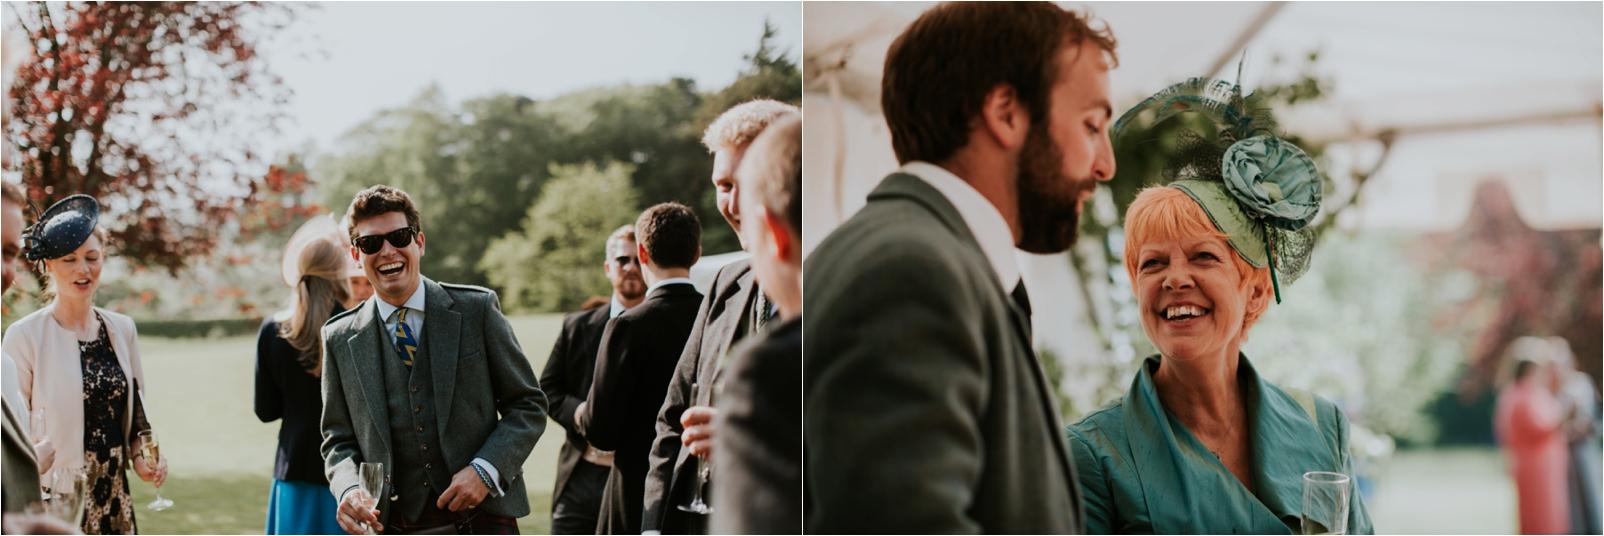 Photography 78 - Scottish Wedding Photographer - Araminta & Jamie_0067.jpg